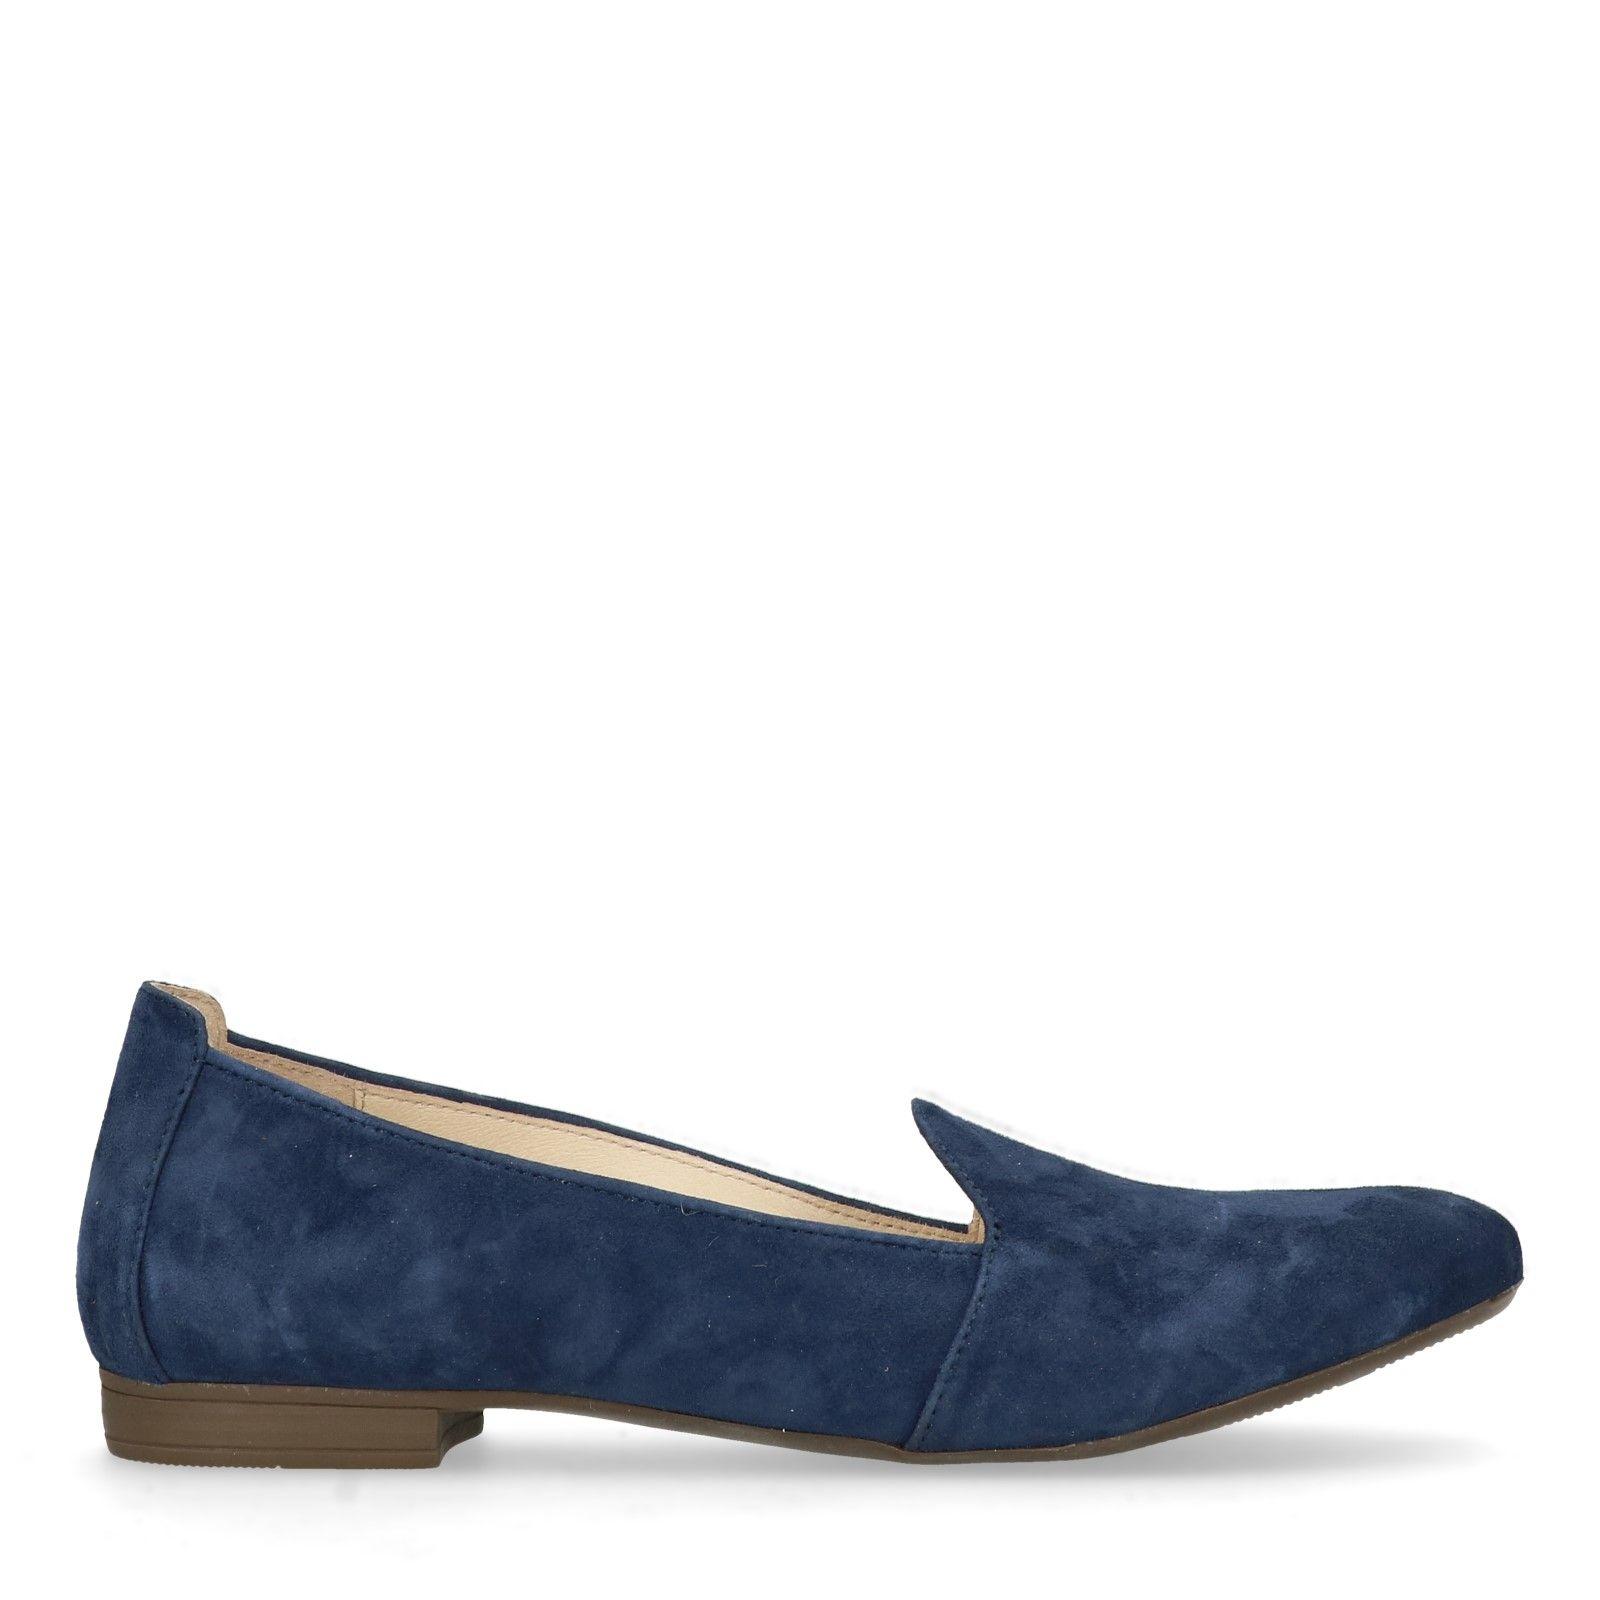 Manfield Blauwe Online Shoppen Sandalen Dames BBqC6wF